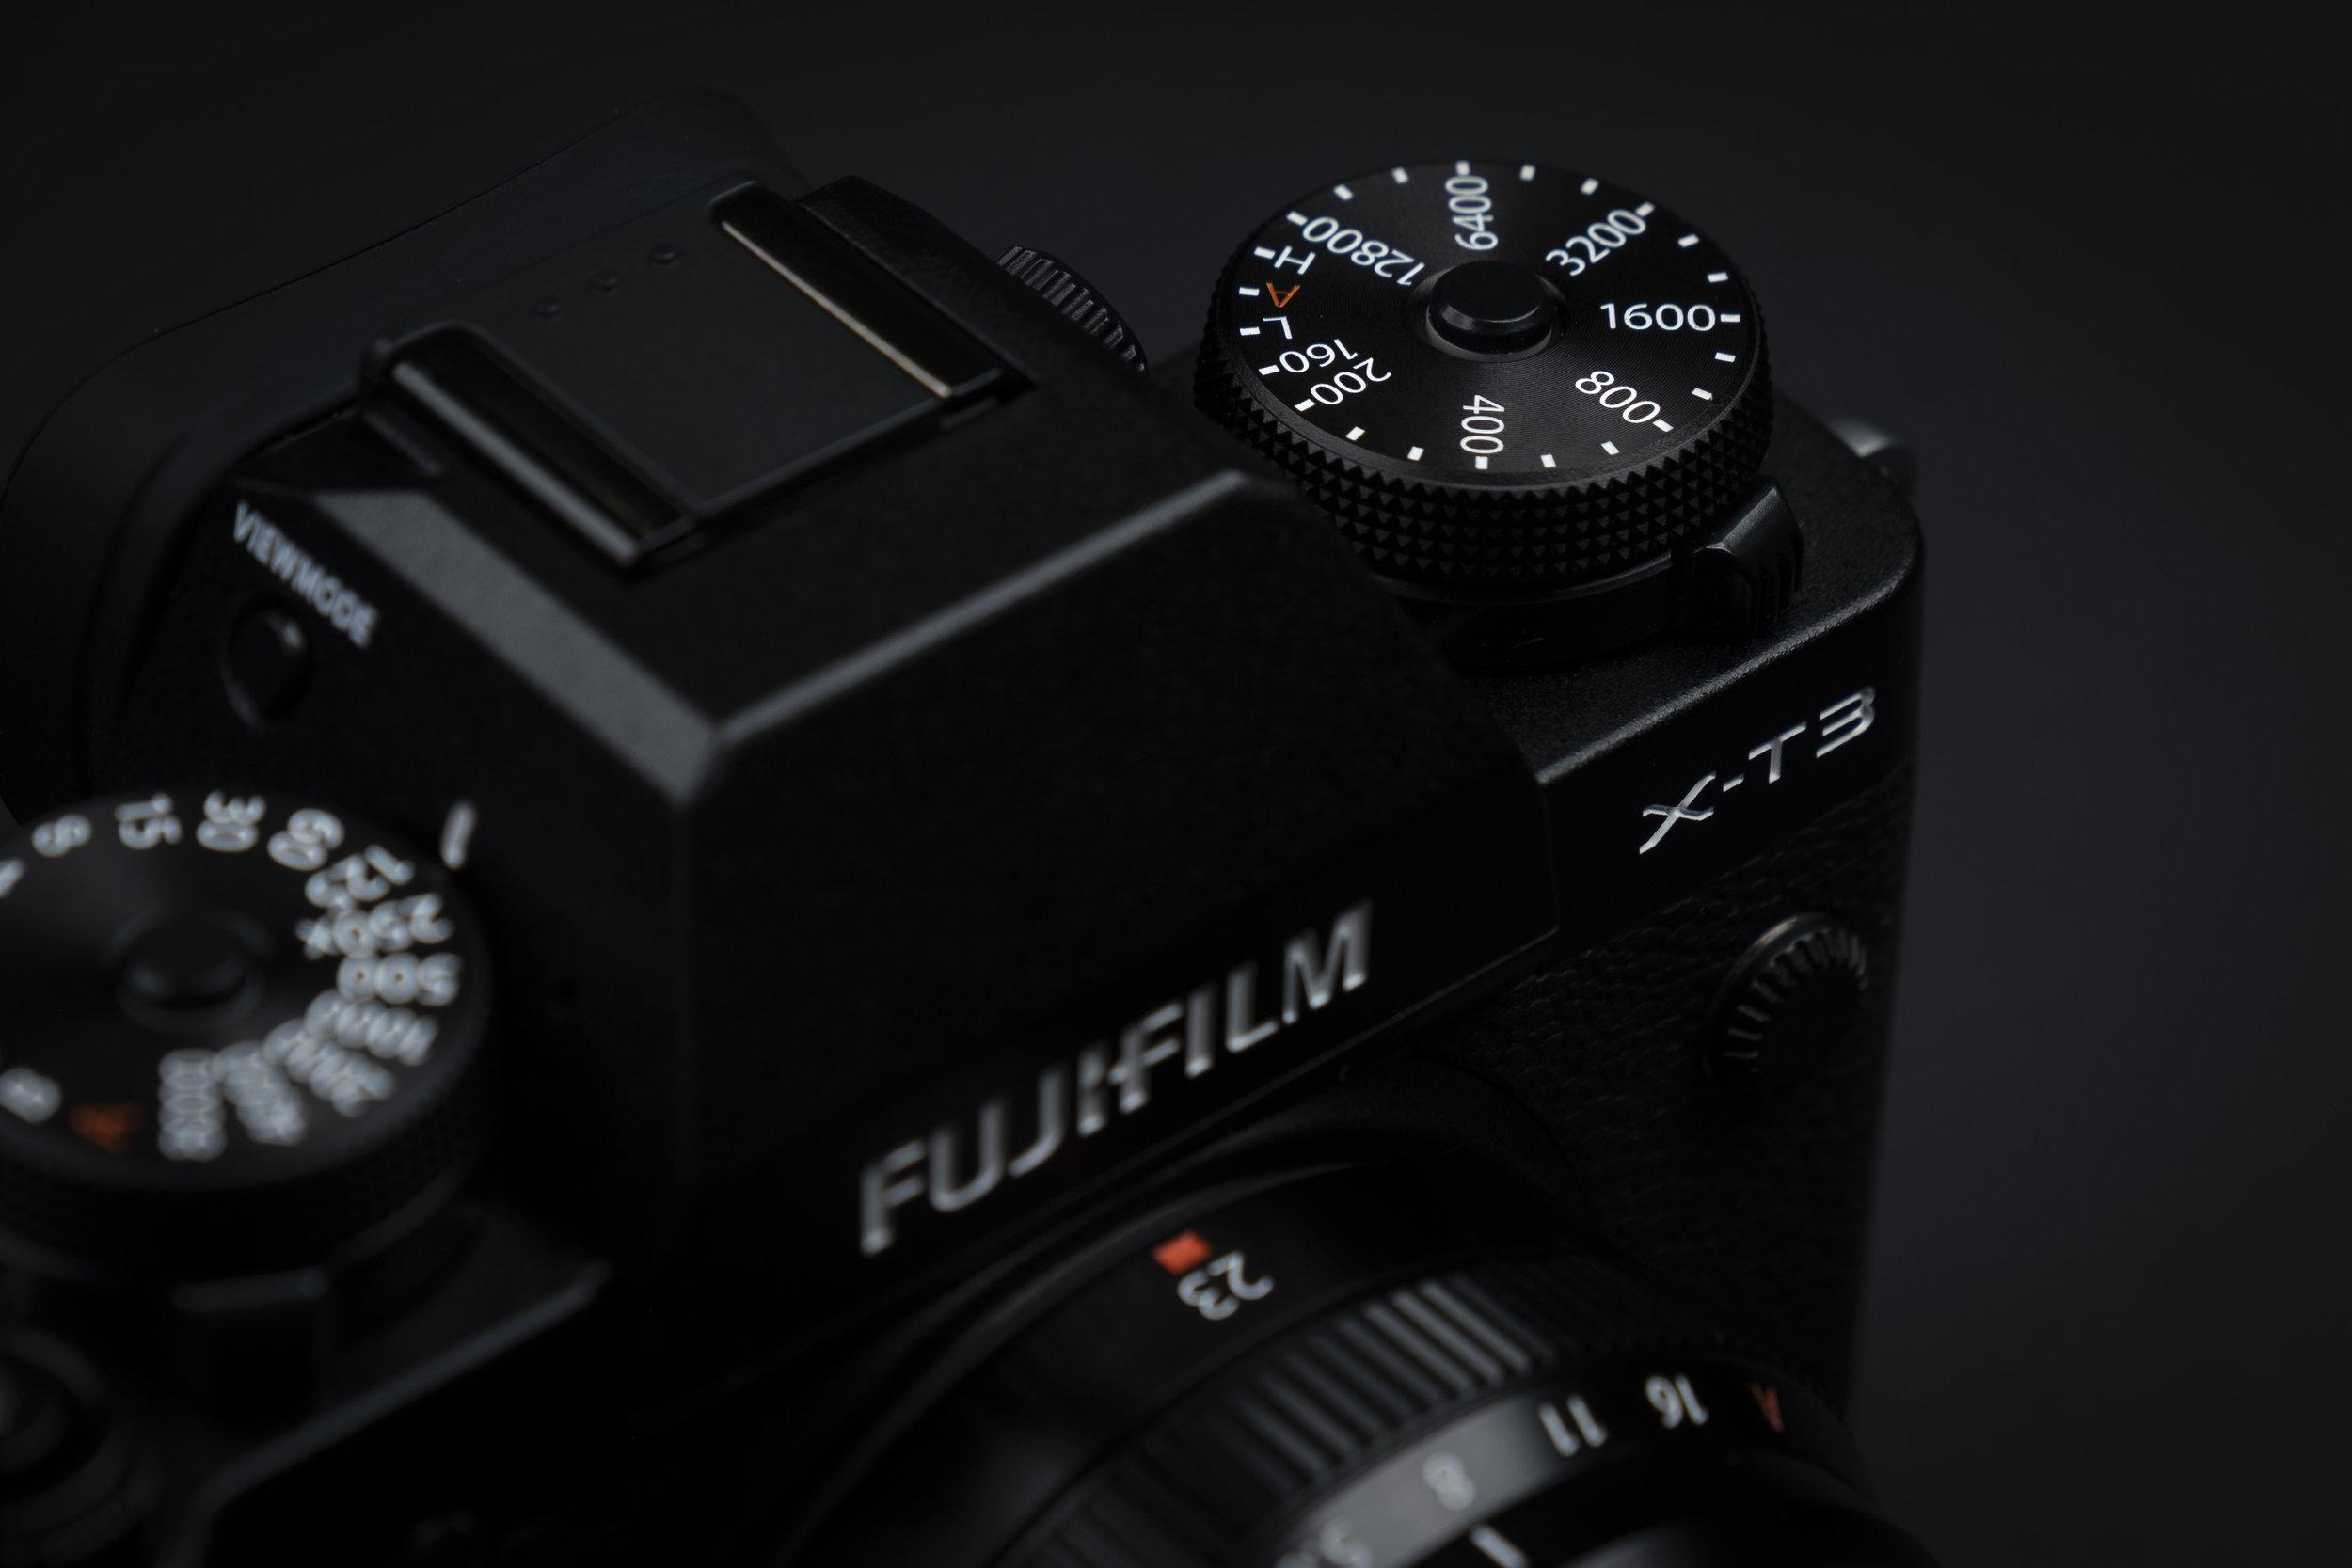 FUJIFILM-X-T3-REVIEW-CAMERA-lr-10.jpg